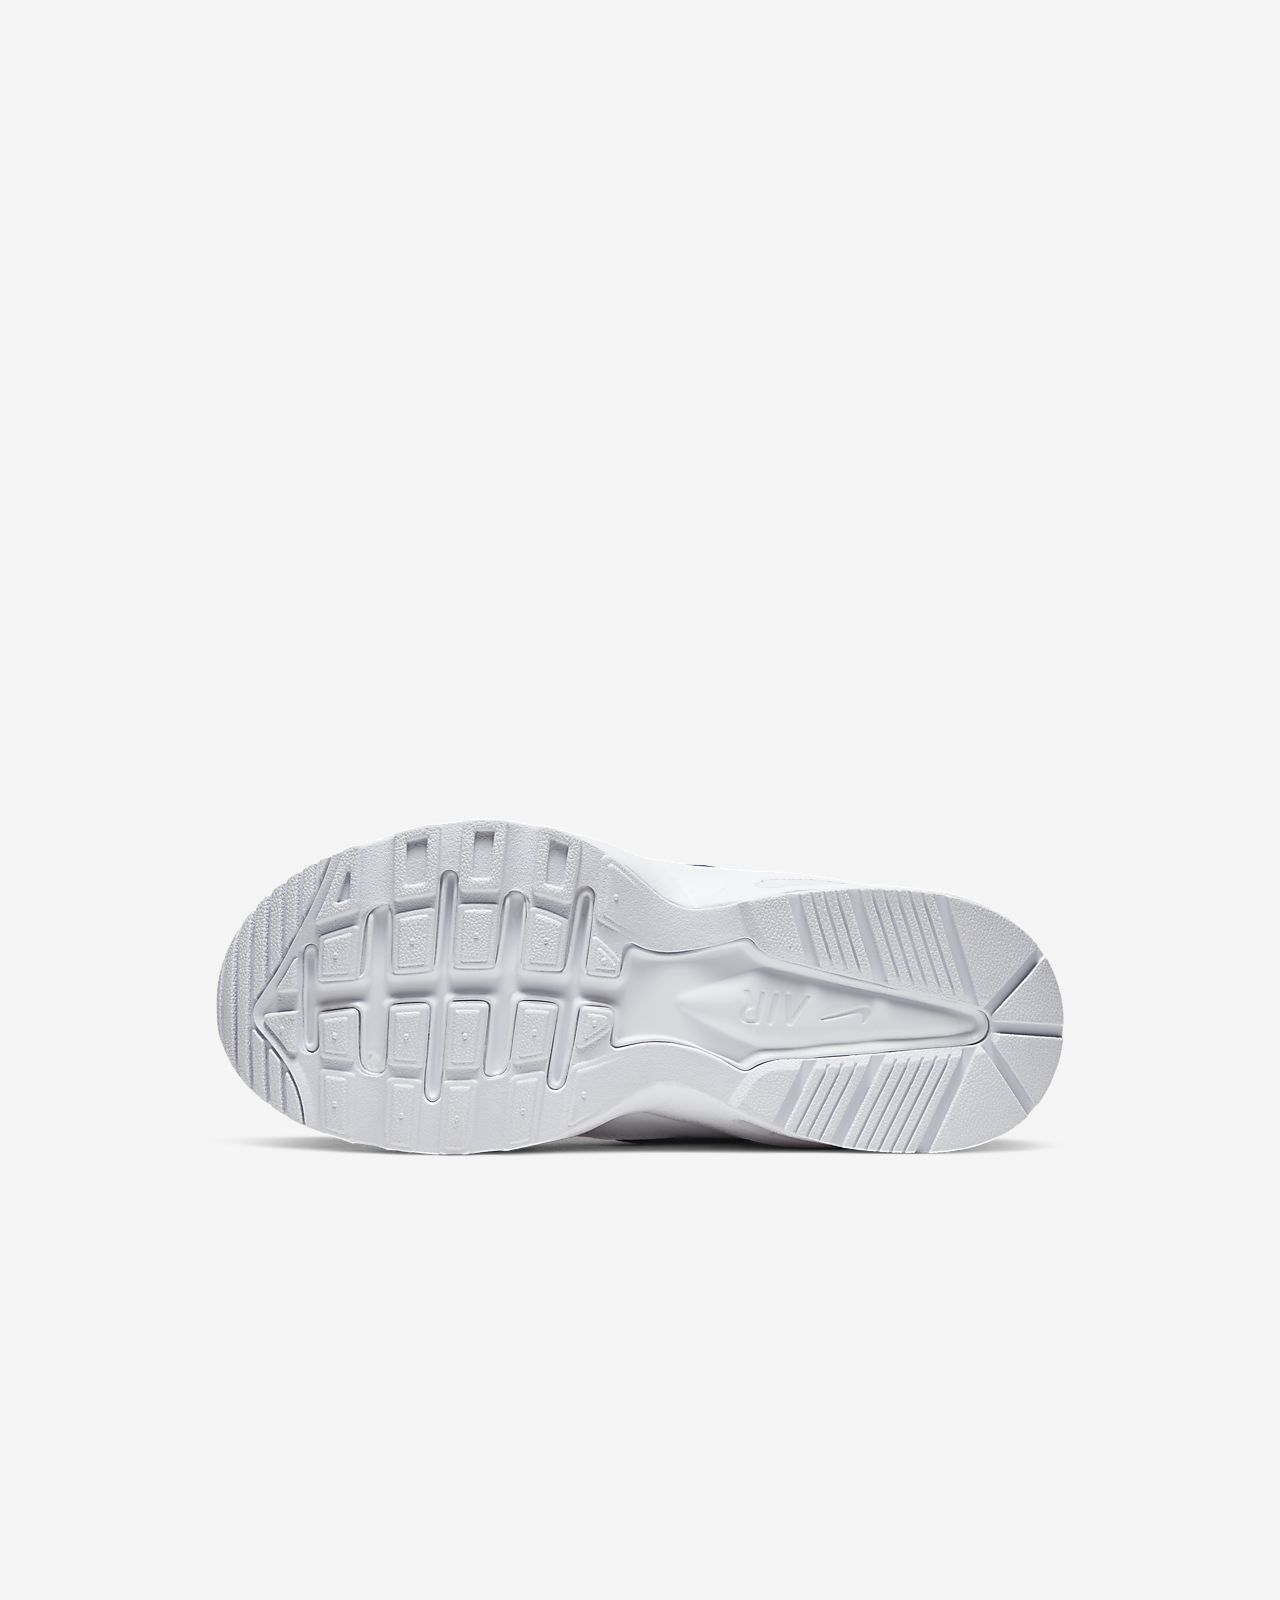 Sko Nike Air Max Fusion för barn